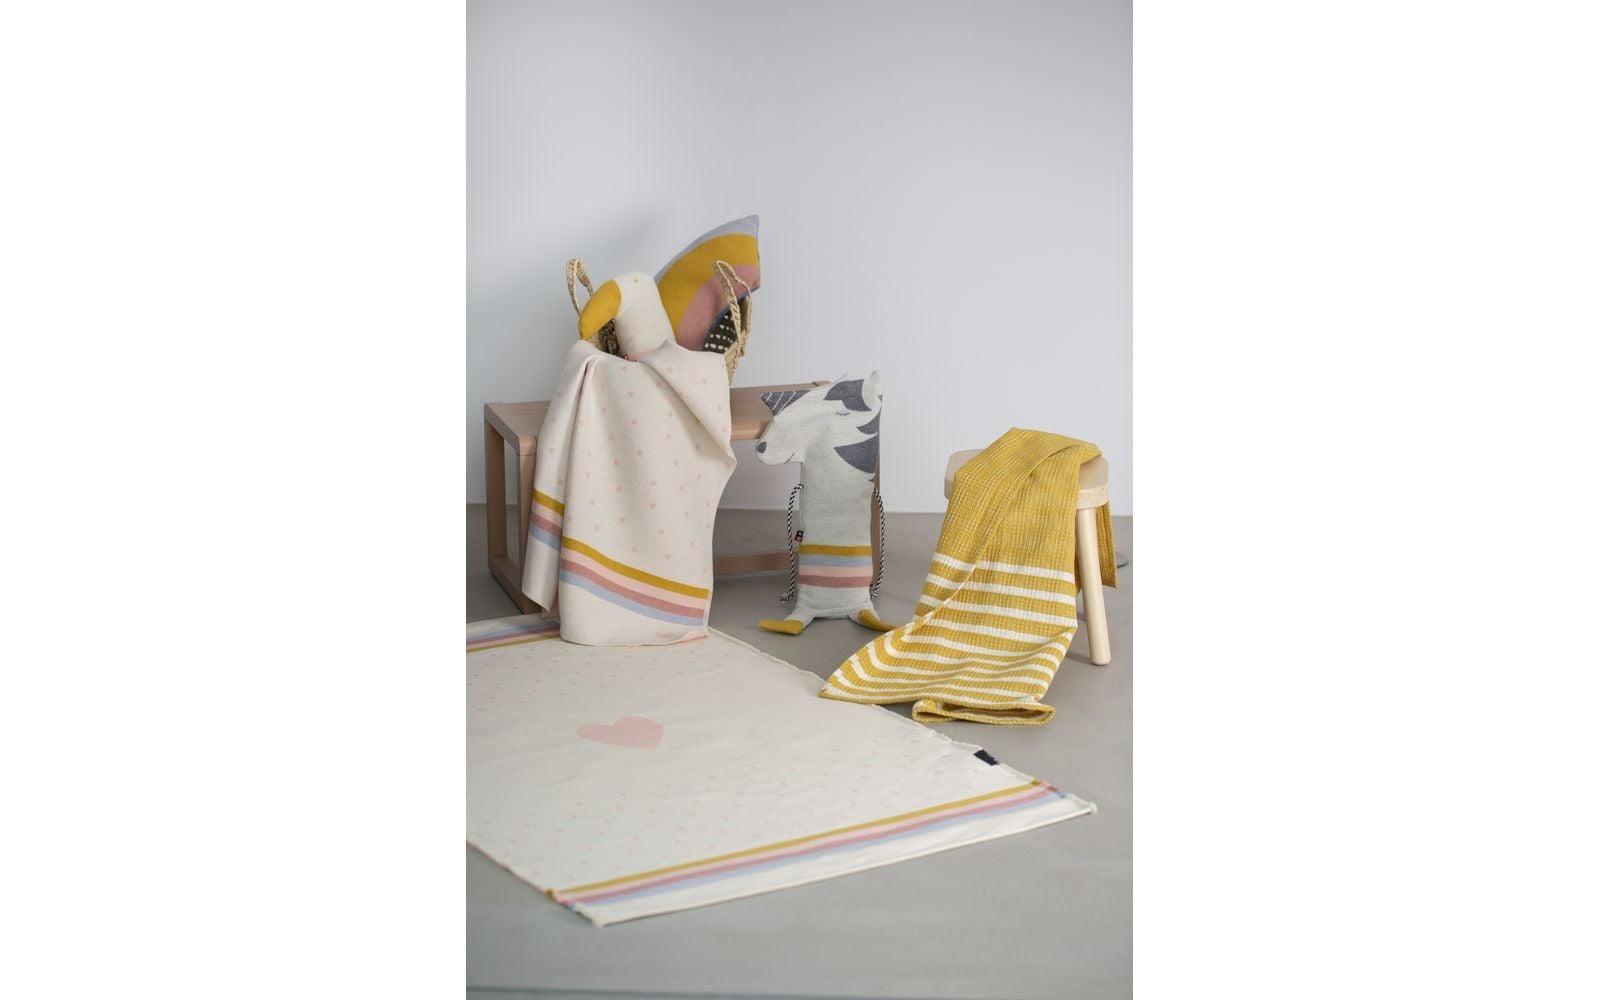 Blanket in Puppet - Unicorn-2